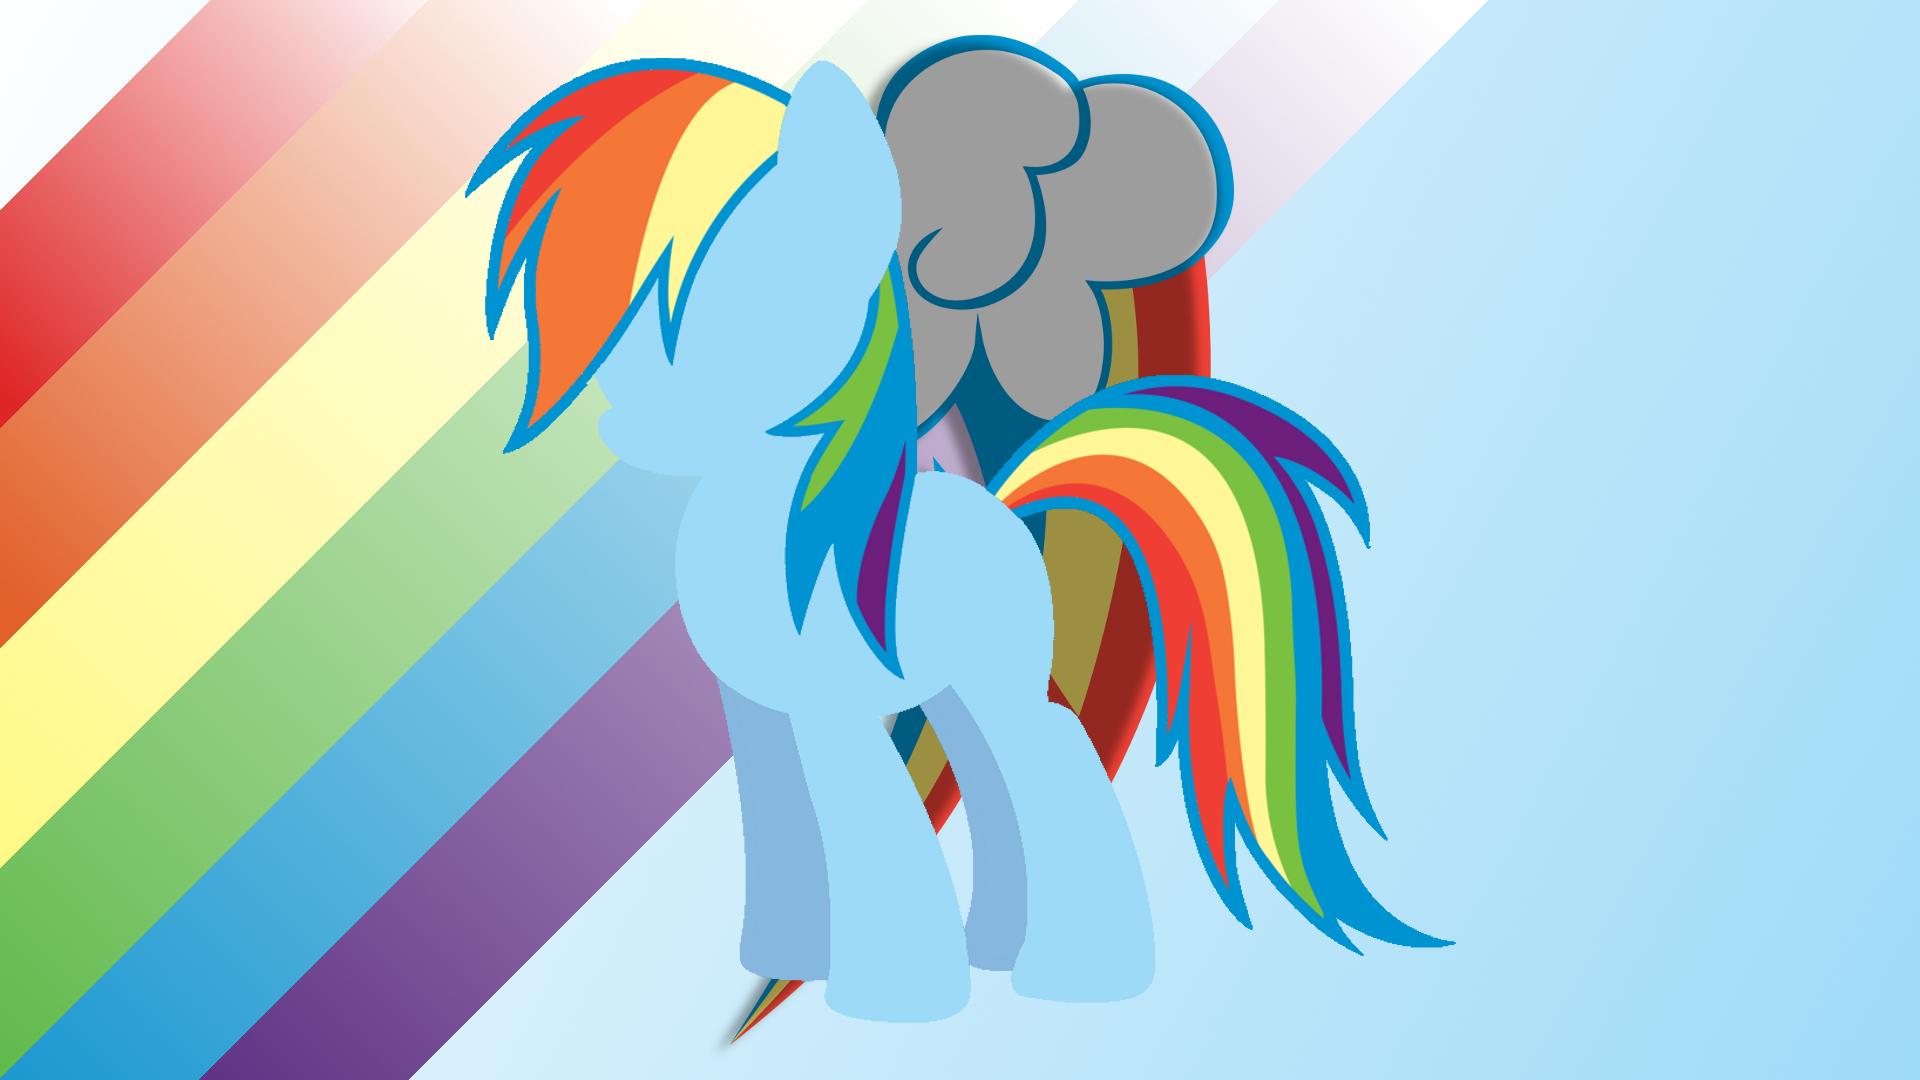 Minimalist Wallpaper 70: Rainbow Dash v2 by BlackGryph0n, geekywebman and Softfang